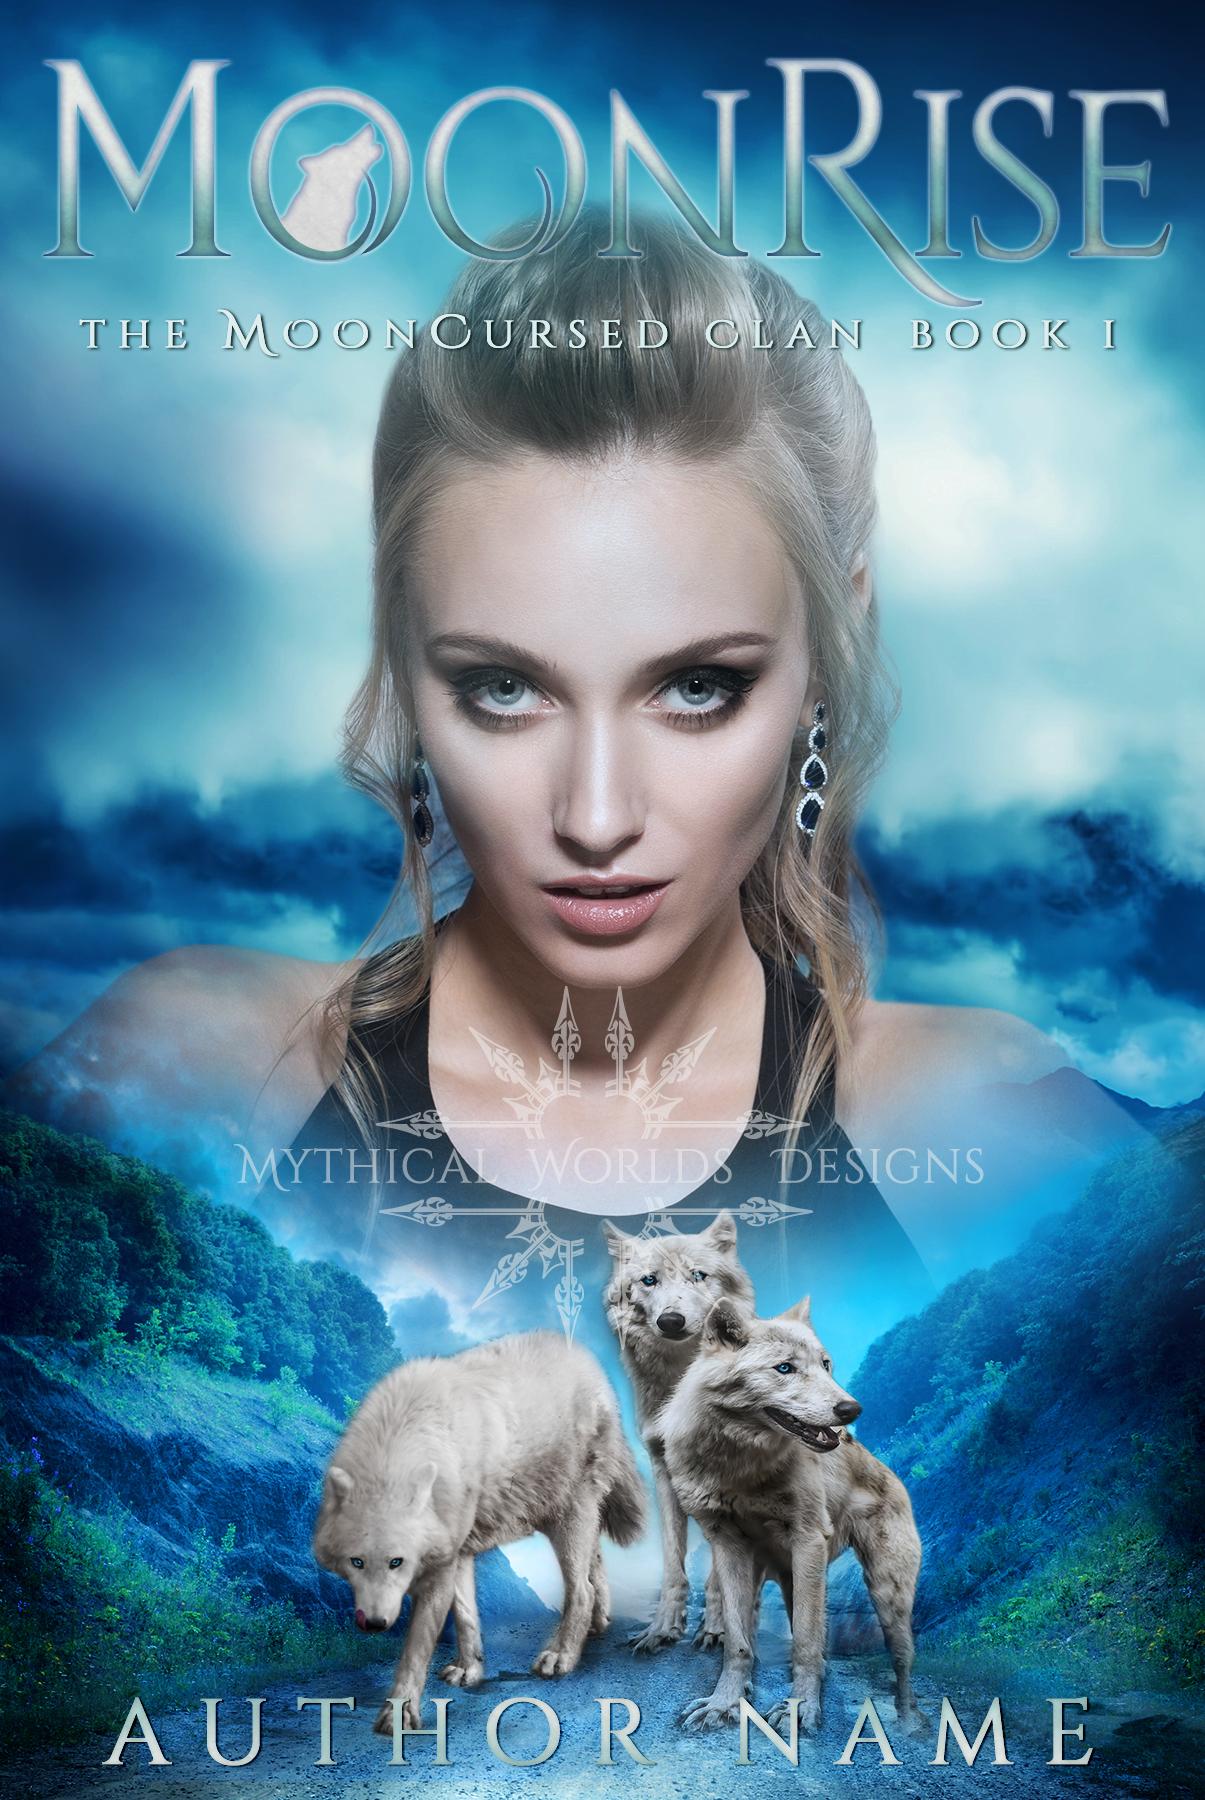 1. MOONRISE- EBOOK COVER